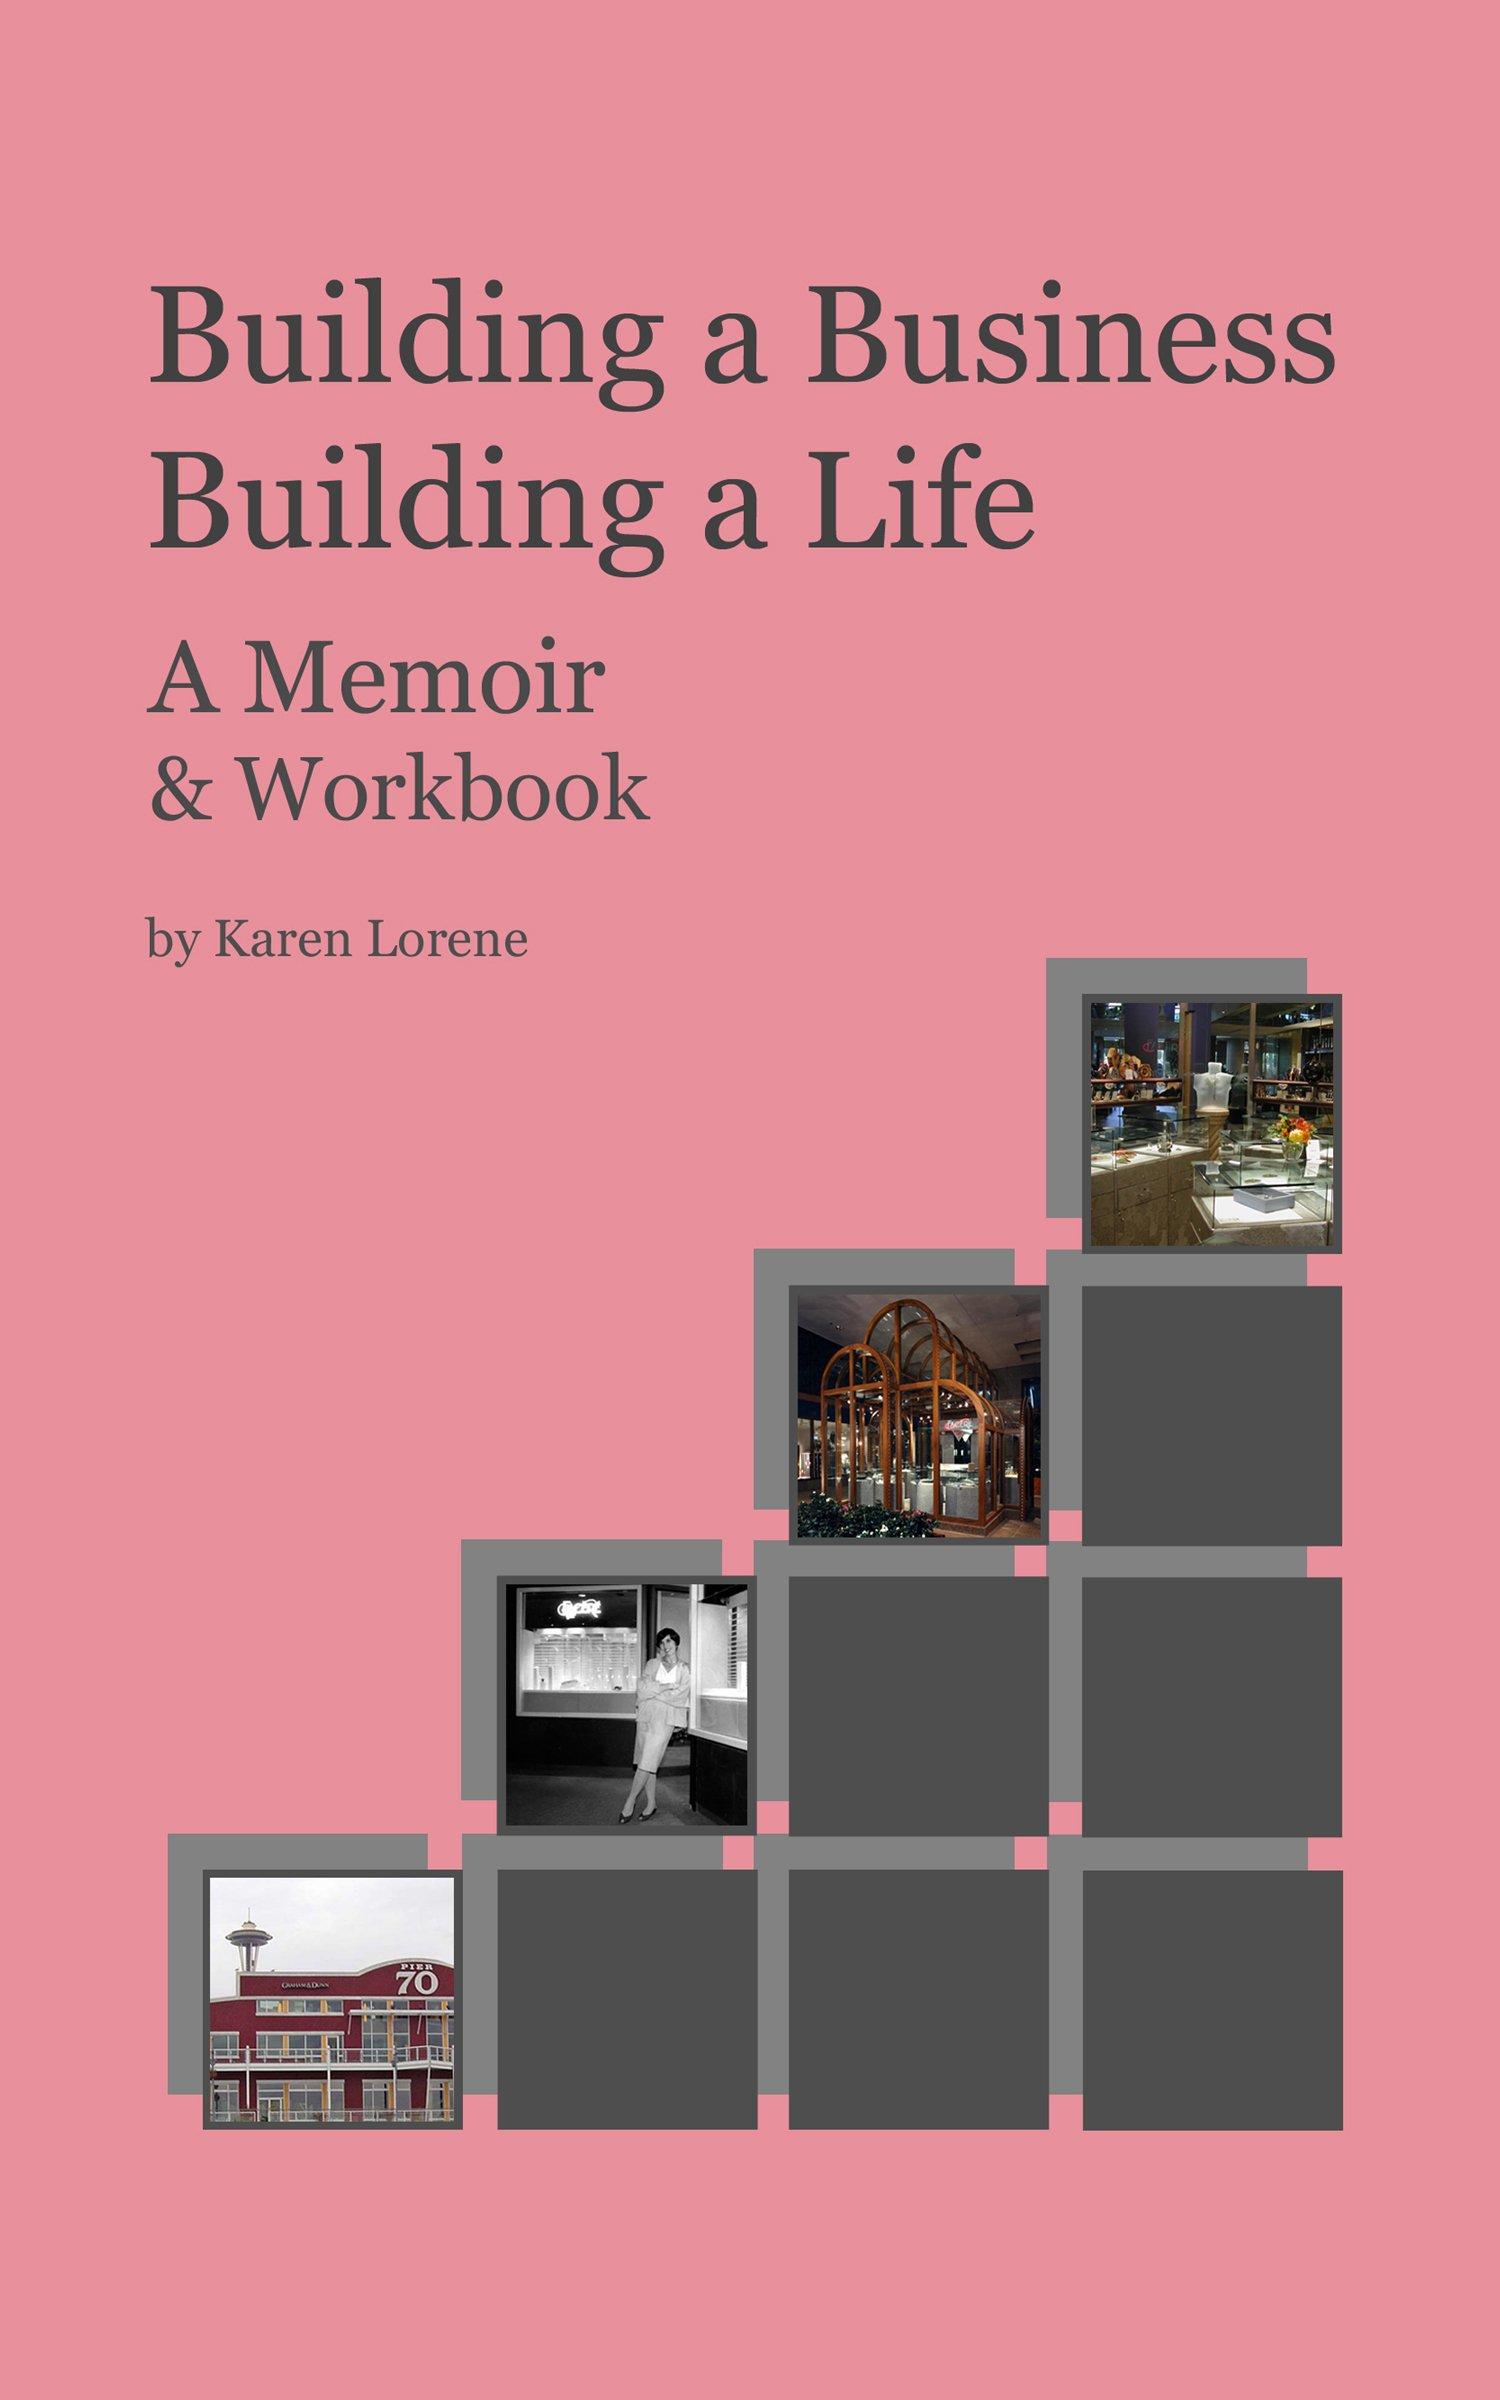 Building a Business, Building a Life pdf